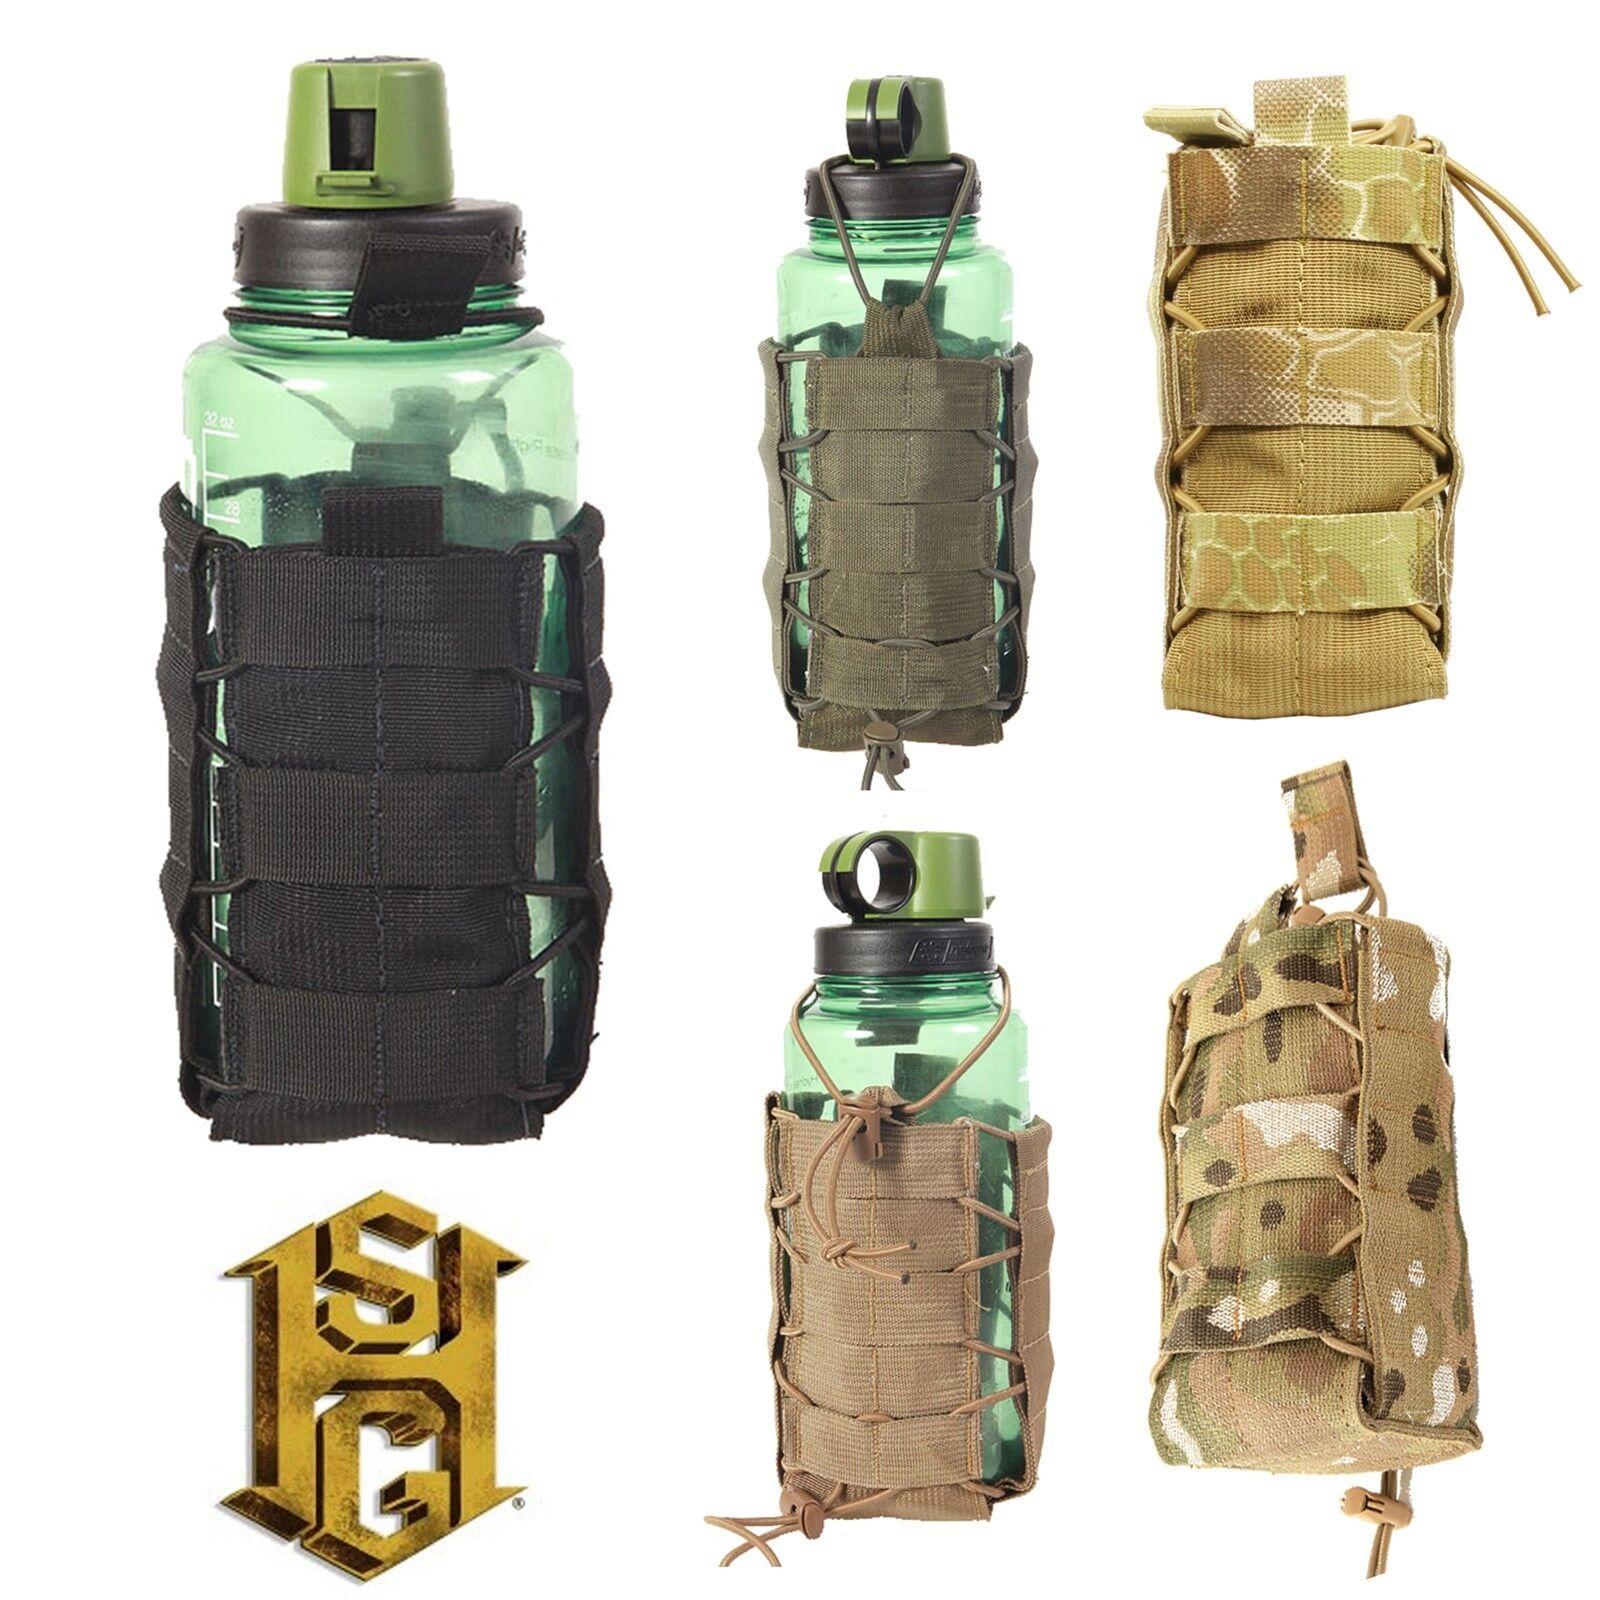 HSGI High Speed Gear MOLLE Belt Mount SOFT TACO Water Bottle Pouch All colors